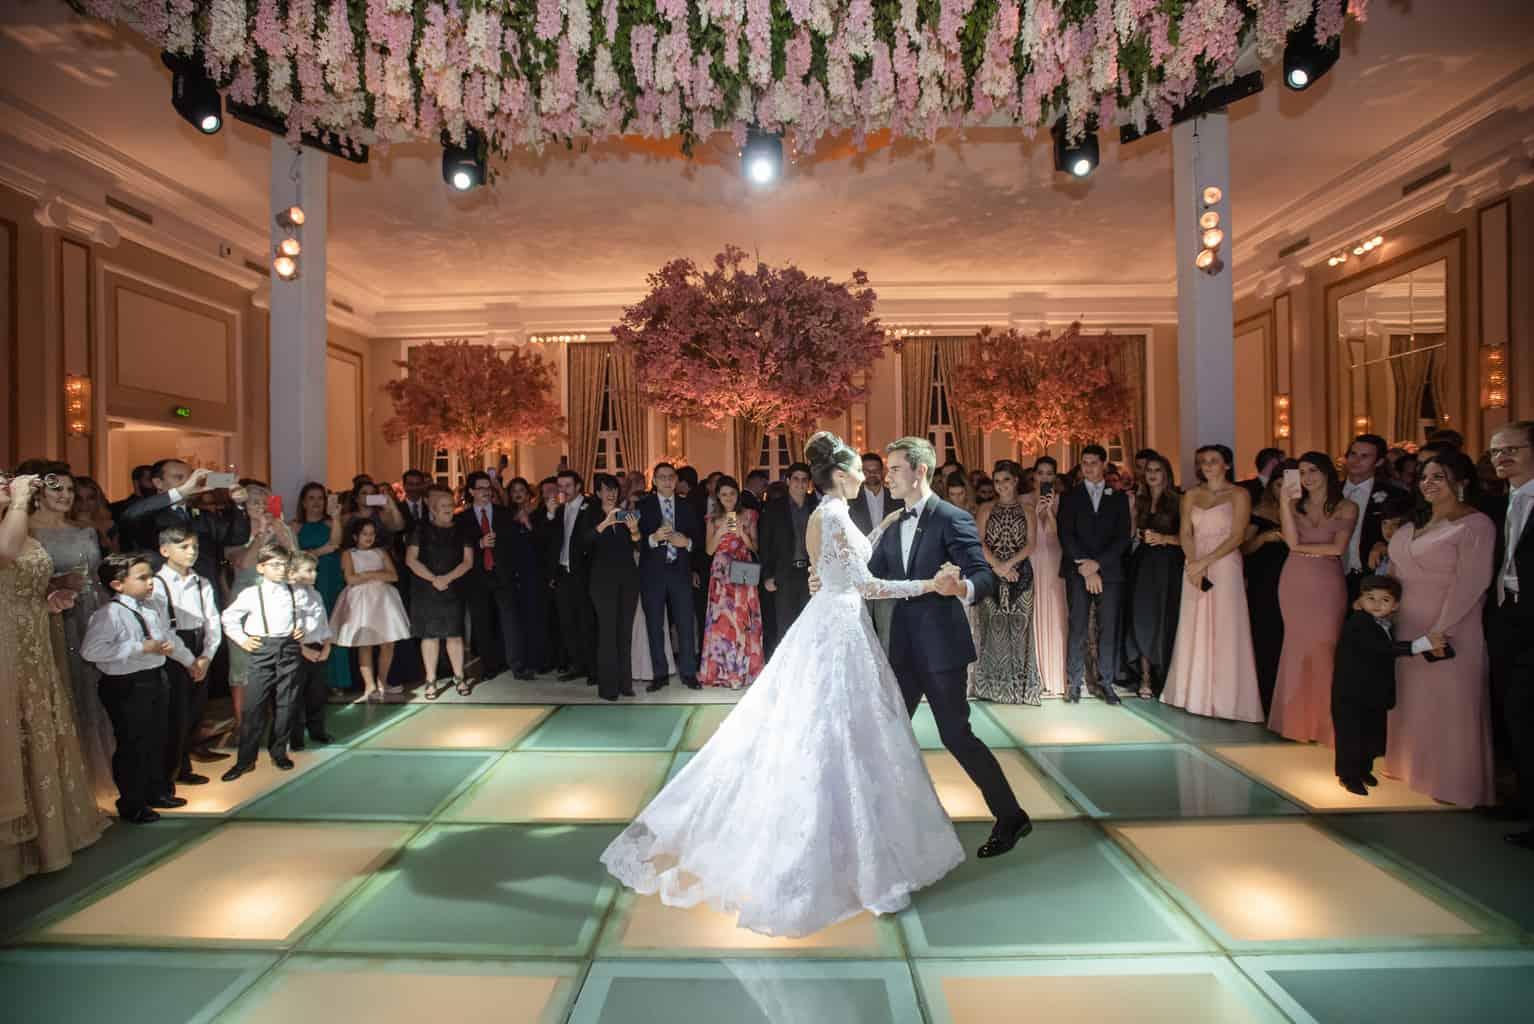 casamento-Patricia-e-Thiago-Copacabana-Palace-Daniel-Curz-A-Roseira-Paula-Rocha-Marina-Fava-festa1487-Patricia-e-Thiago-MFF_1647